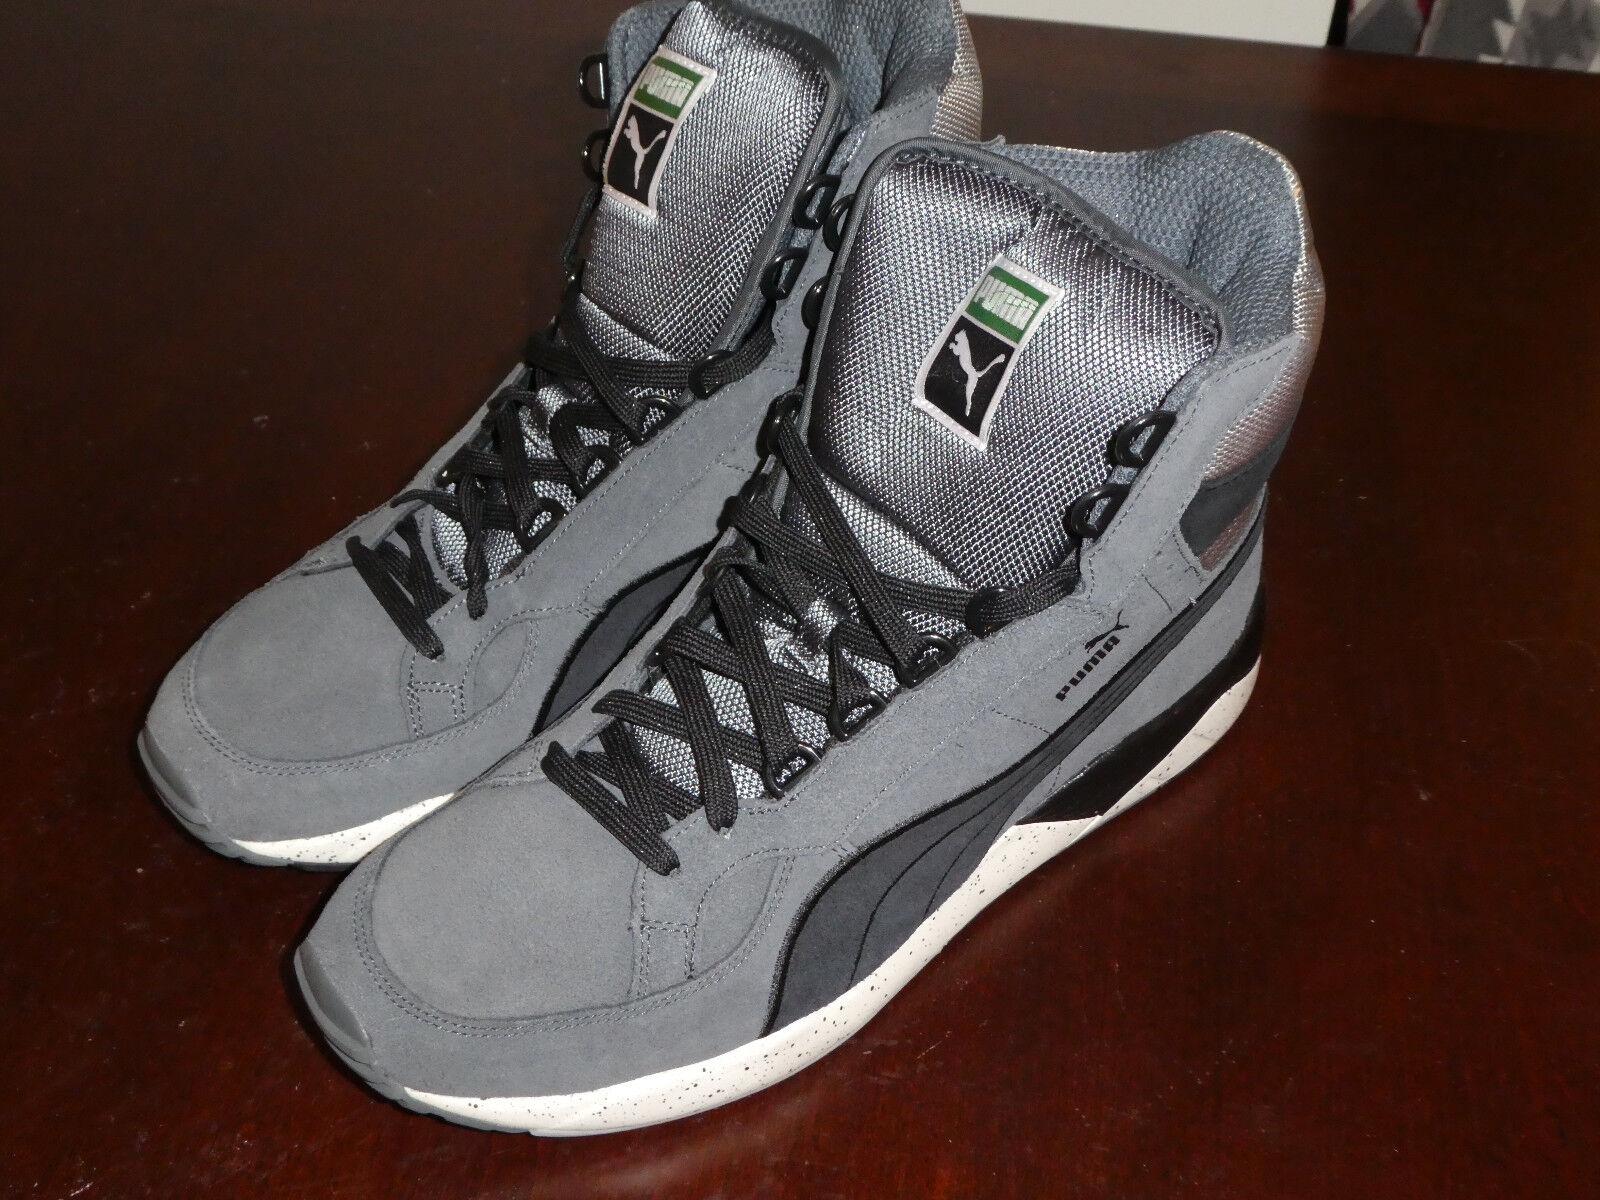 Puma Trinomic 850 XS Mi 357028 shoes mens new sneakers 357028 Mi 02 grey boots 5c5a2e